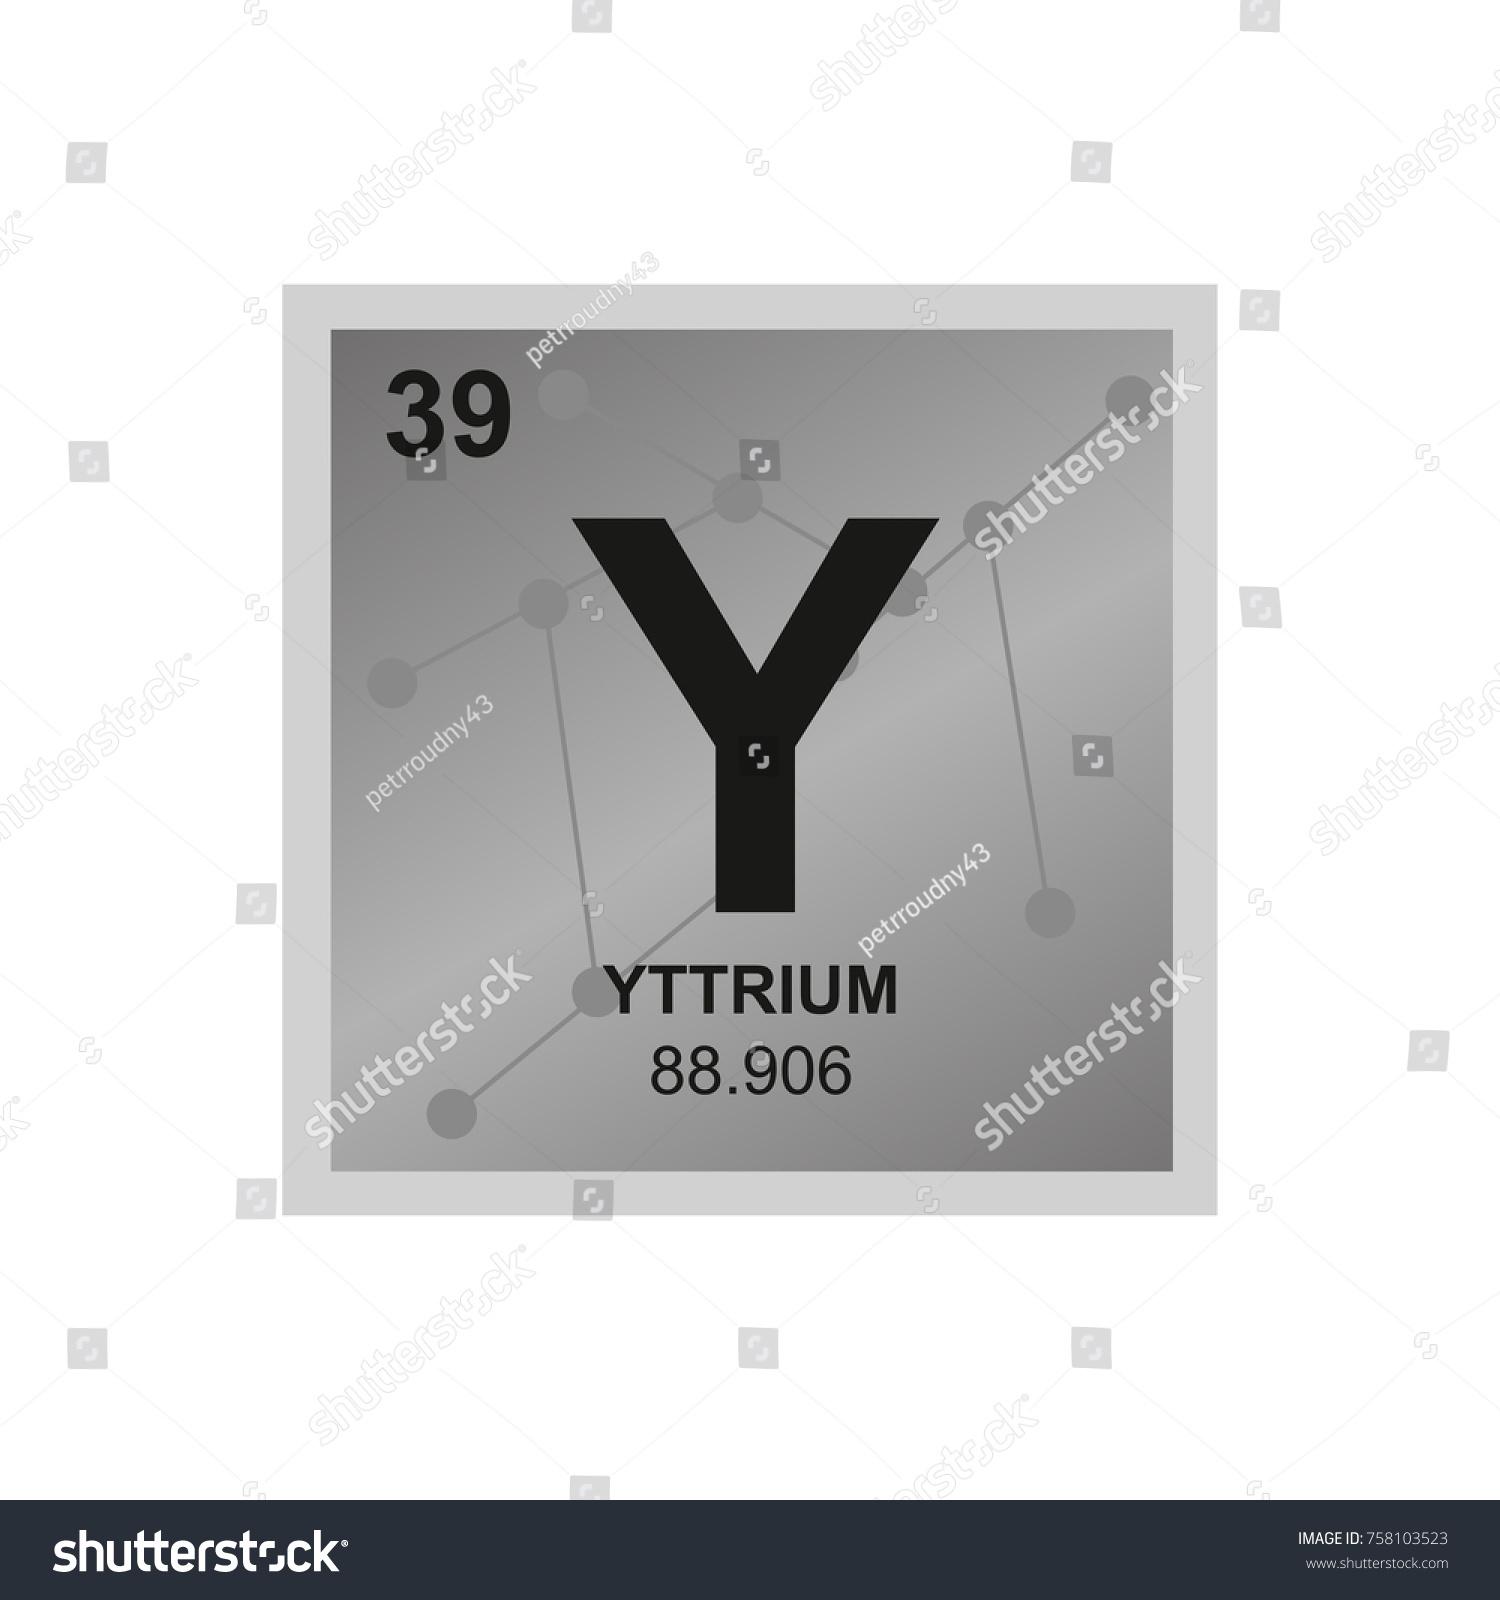 Periodic table element yttrium icon fm transmitter schematic diagram vector symbol yttrium periodic table elements stock vector stock vector vector symbol of yttrium from the periodic table of the elements on the background gamestrikefo Gallery